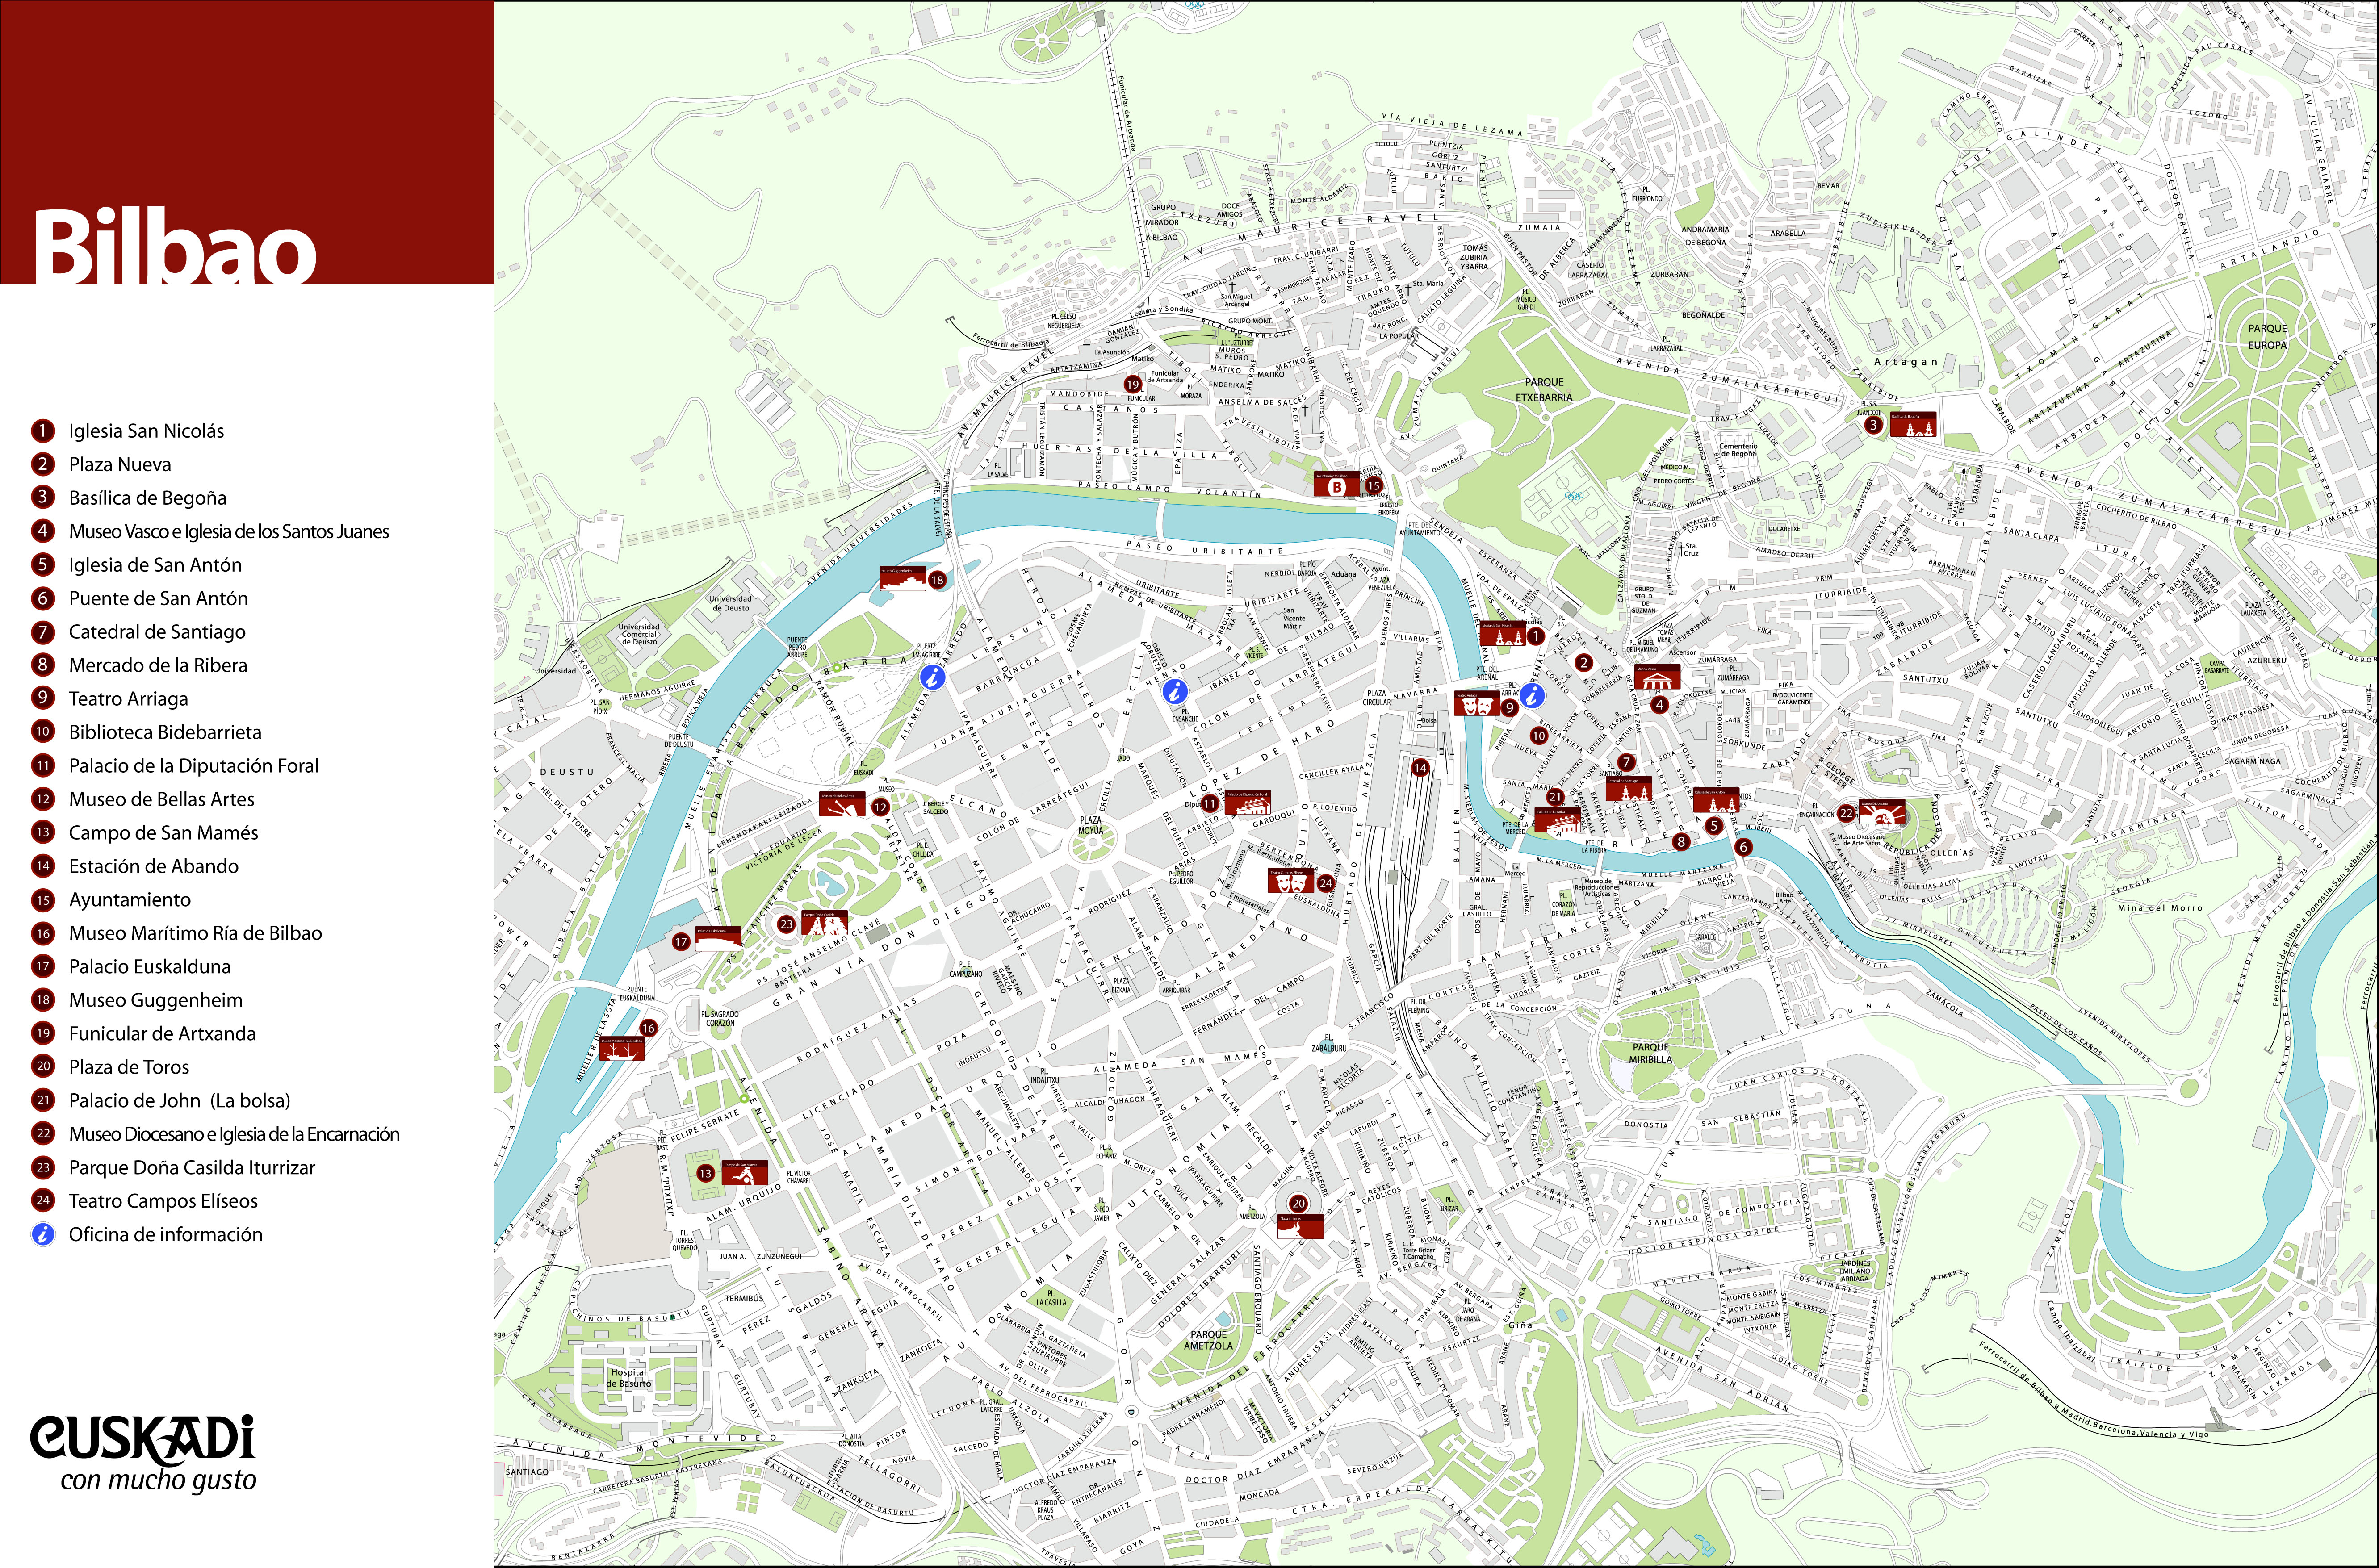 Mapa turístico de Bilbao